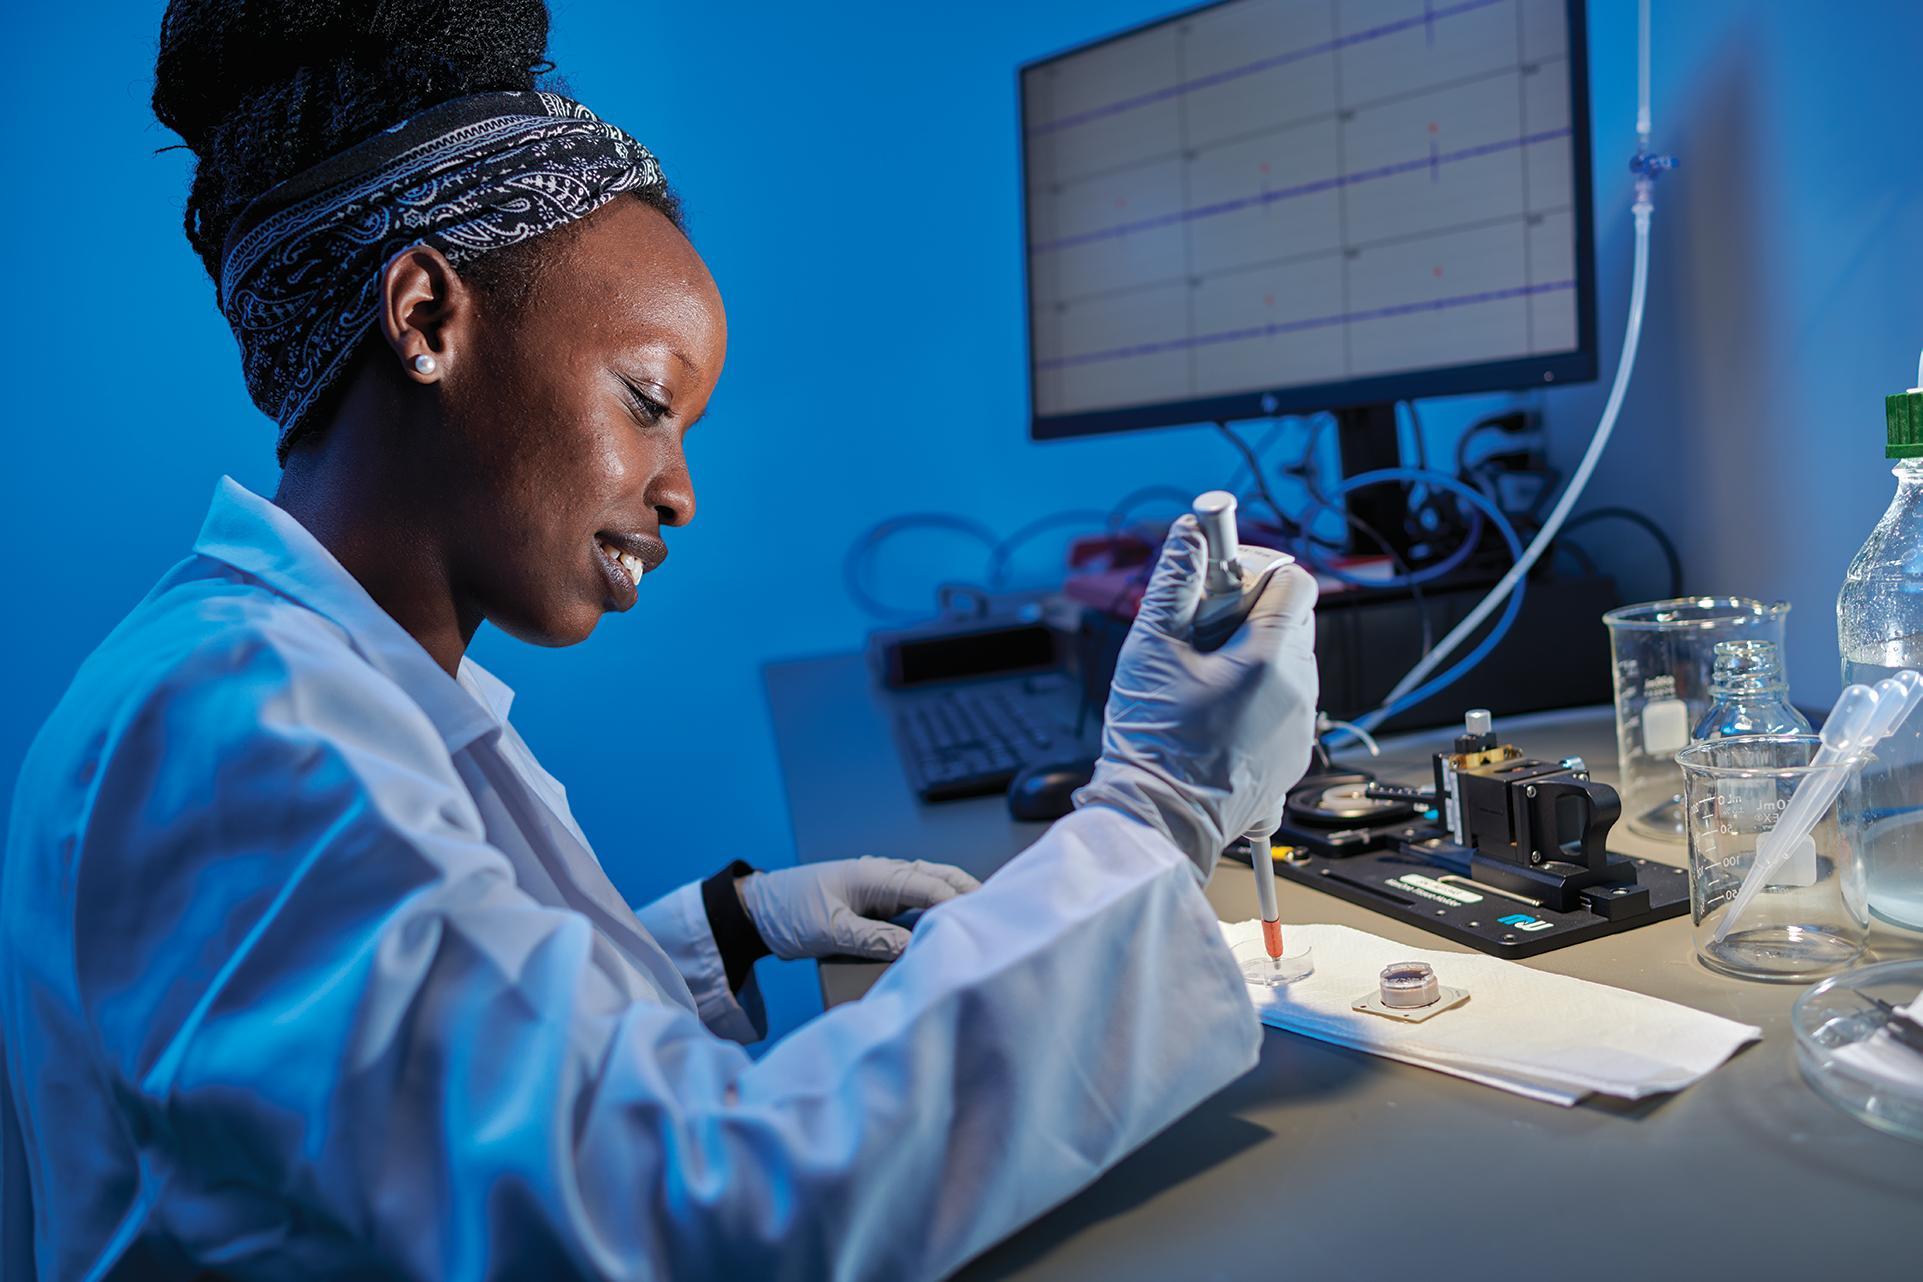 scientist prepares microelectrode array